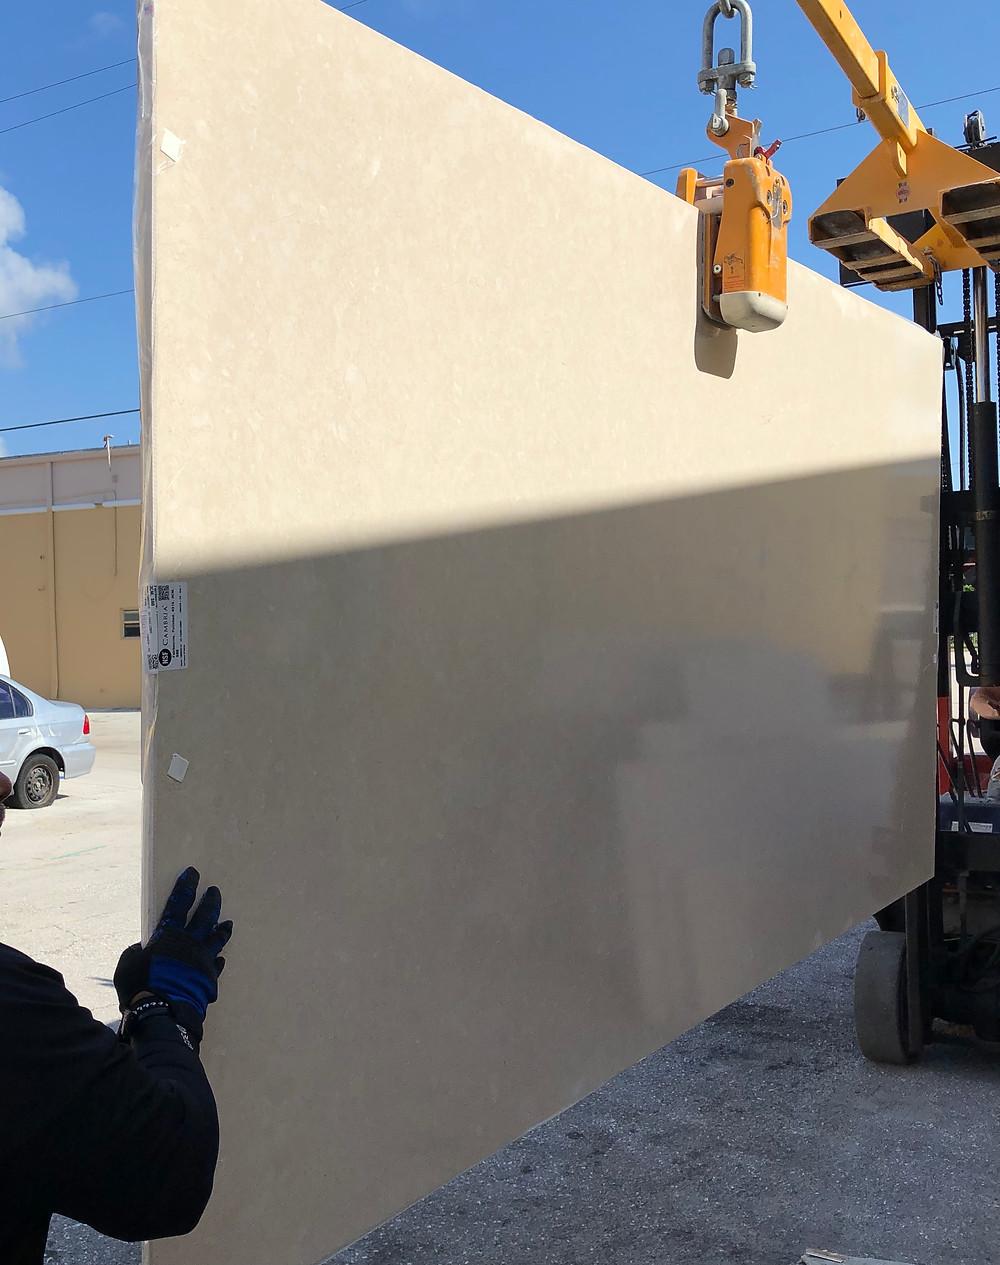 countertops installation in Boca Raton FL. Cambria countertops Boca Raton FL